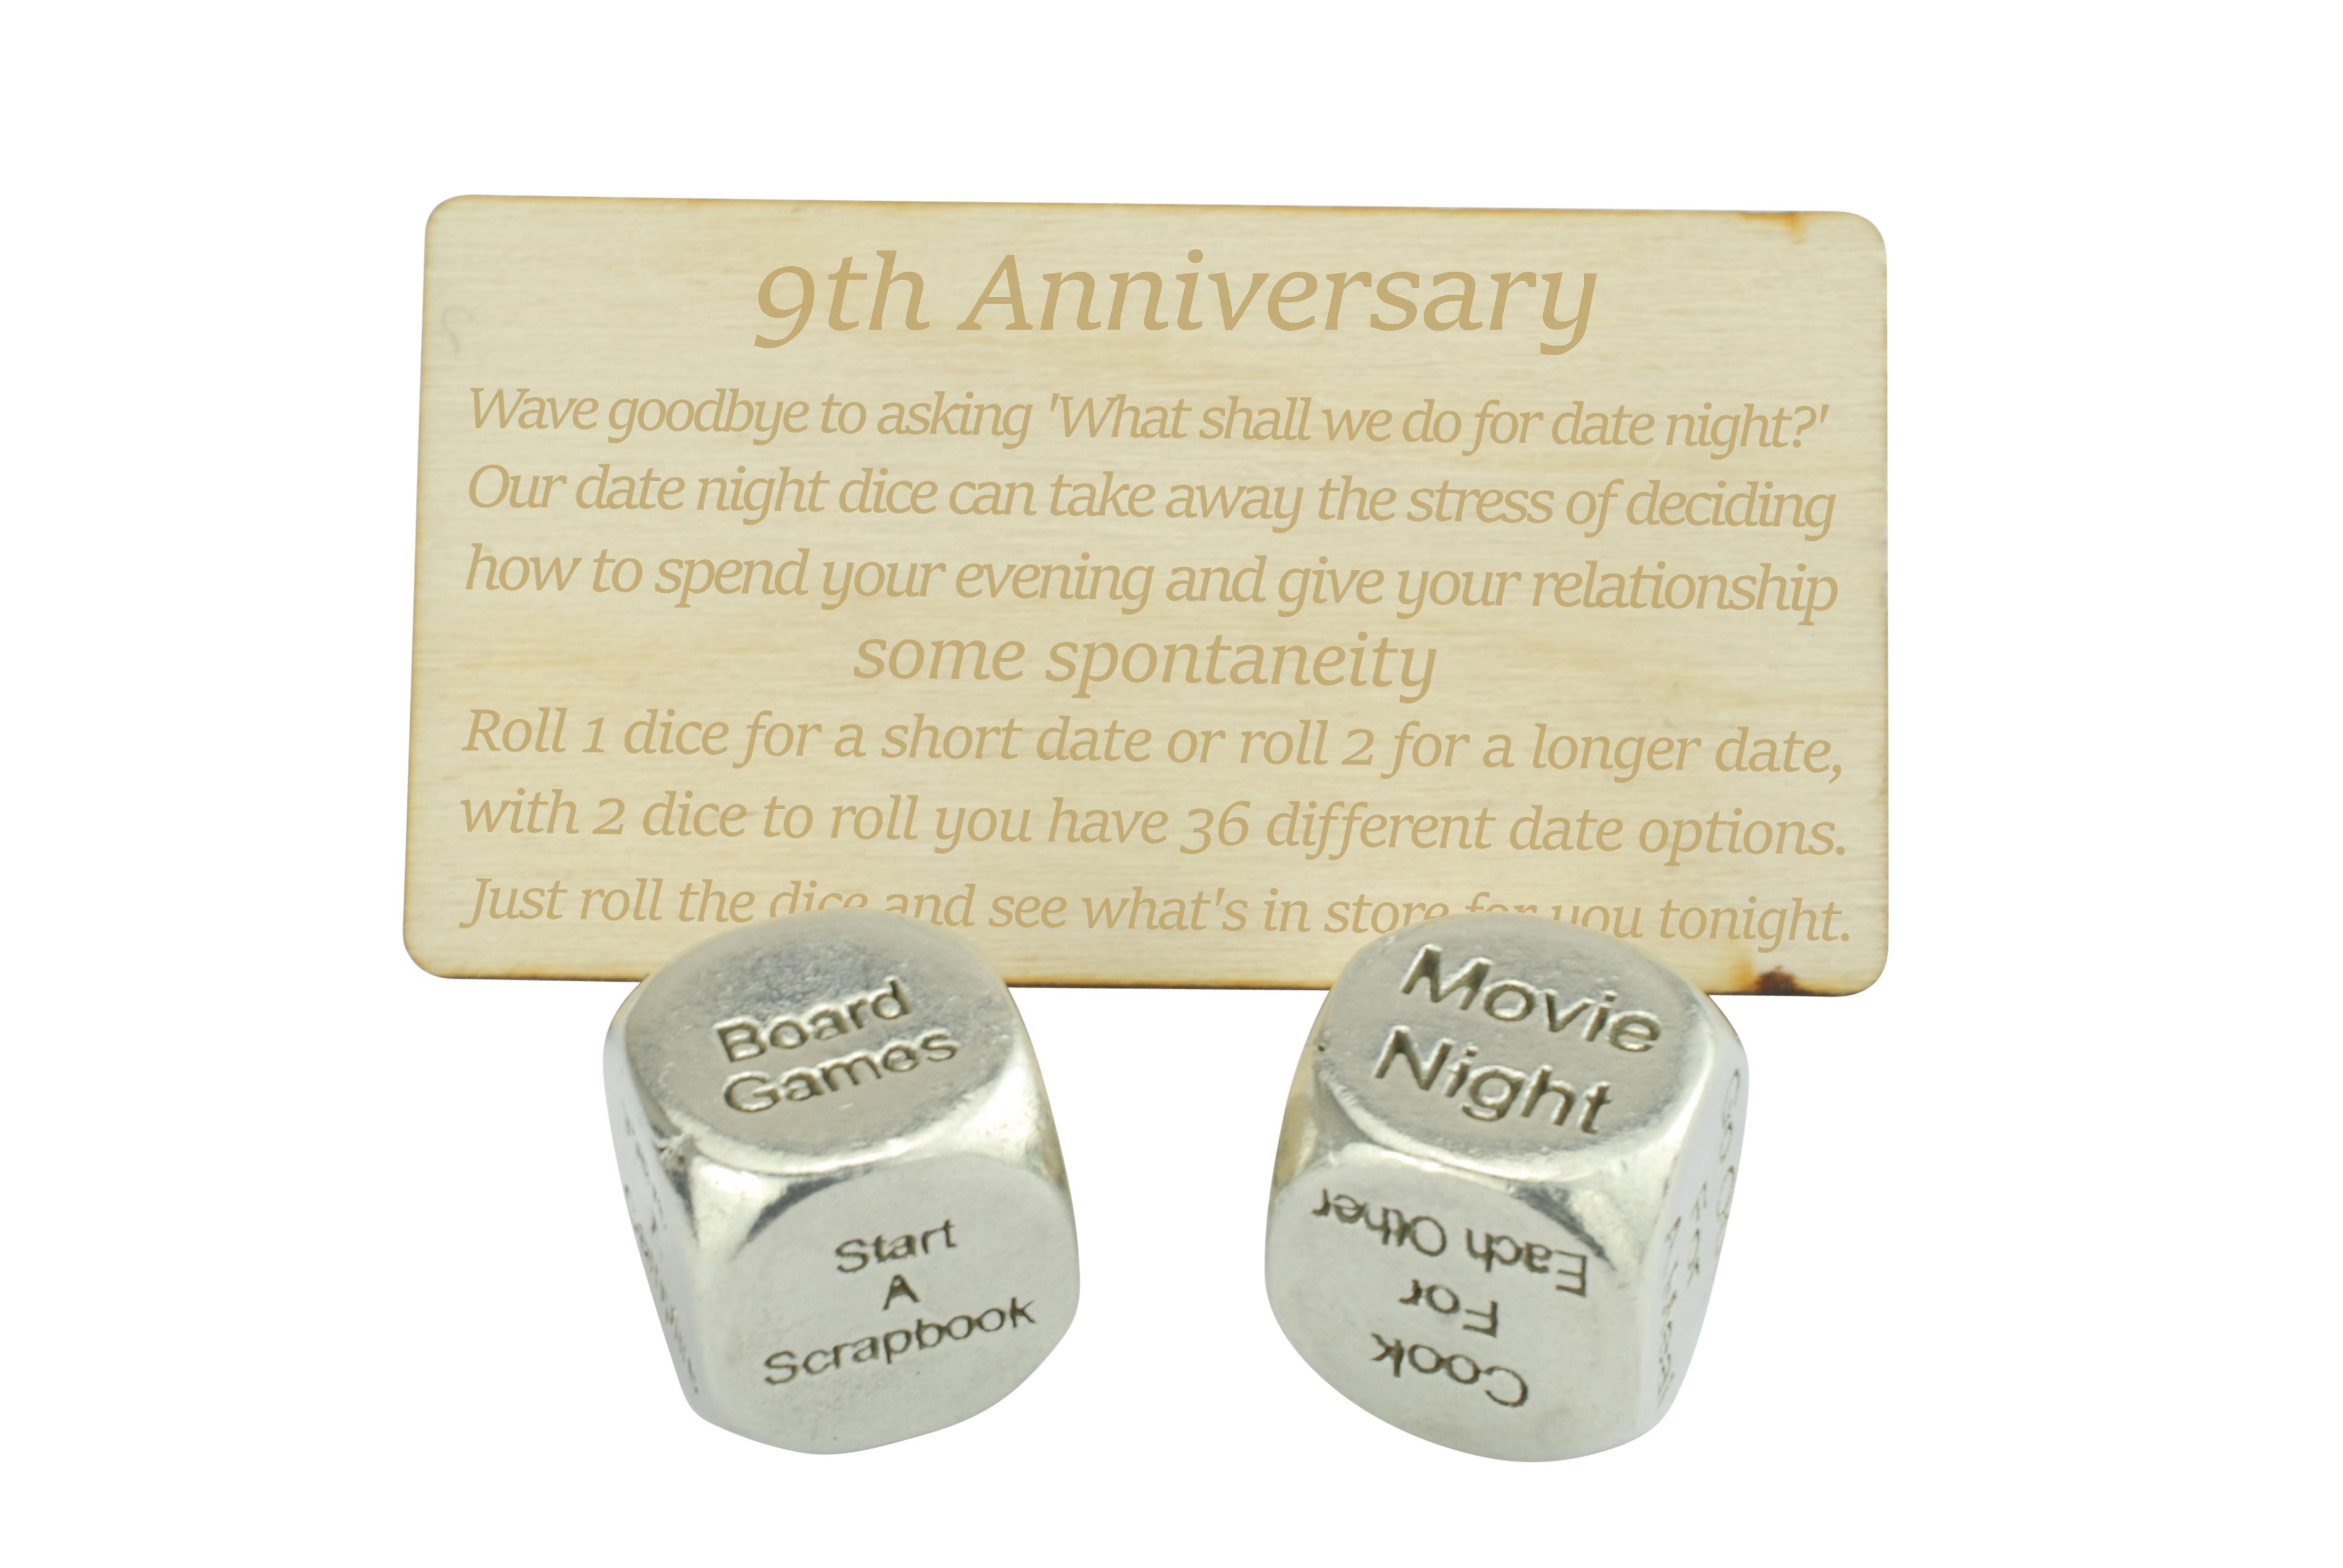 9 Year Anniversary Date Night Decider Dice Anniversary Gifts